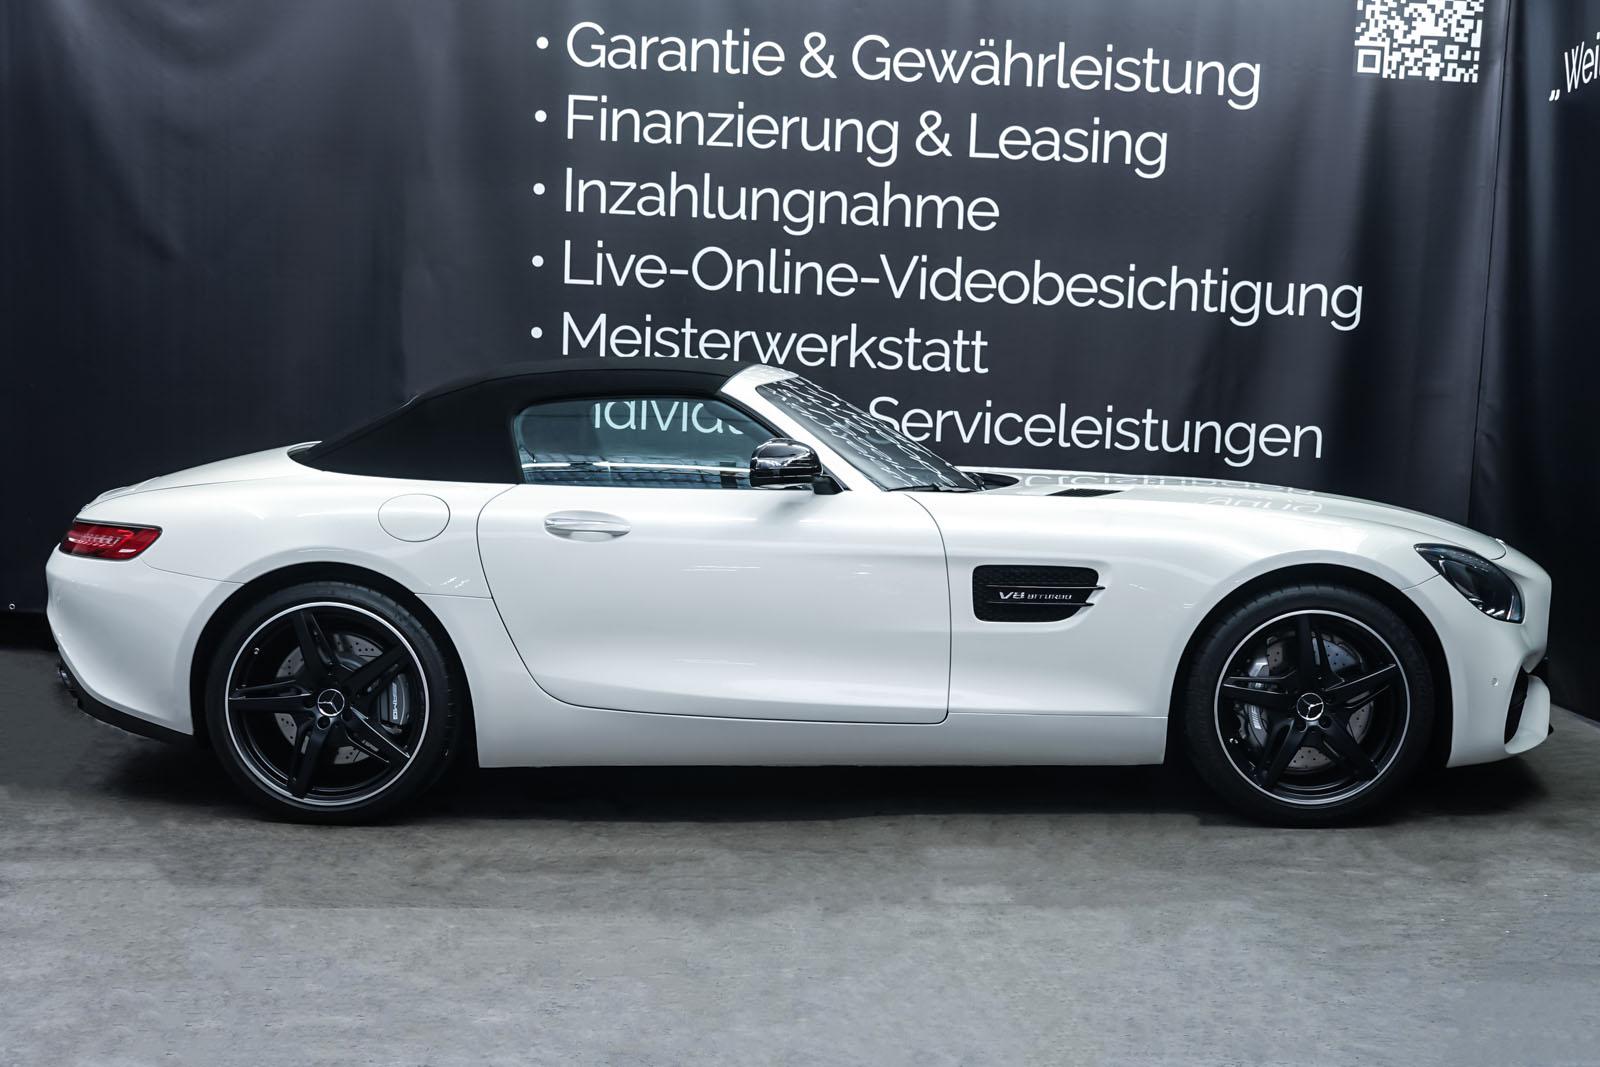 11Mercedes_Benz_AMG_GT_Roadster_Weiss_Schwarz_MB-9710_22_w